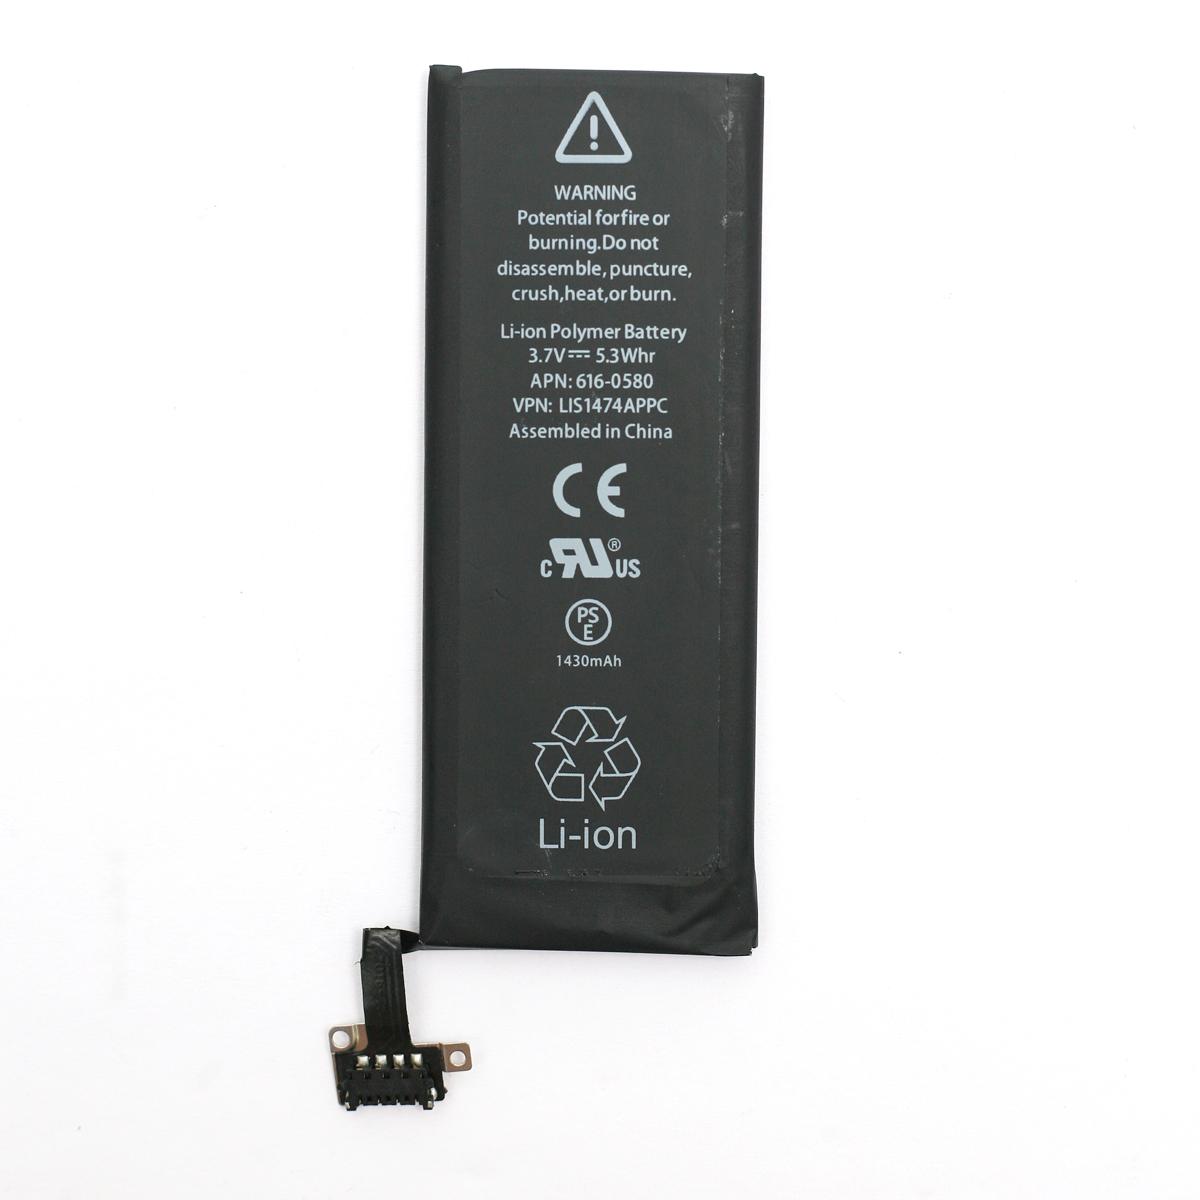 Купить Аккумулятор PowerPlant Apple iPhone 4S (616-0580) new 1430mAh